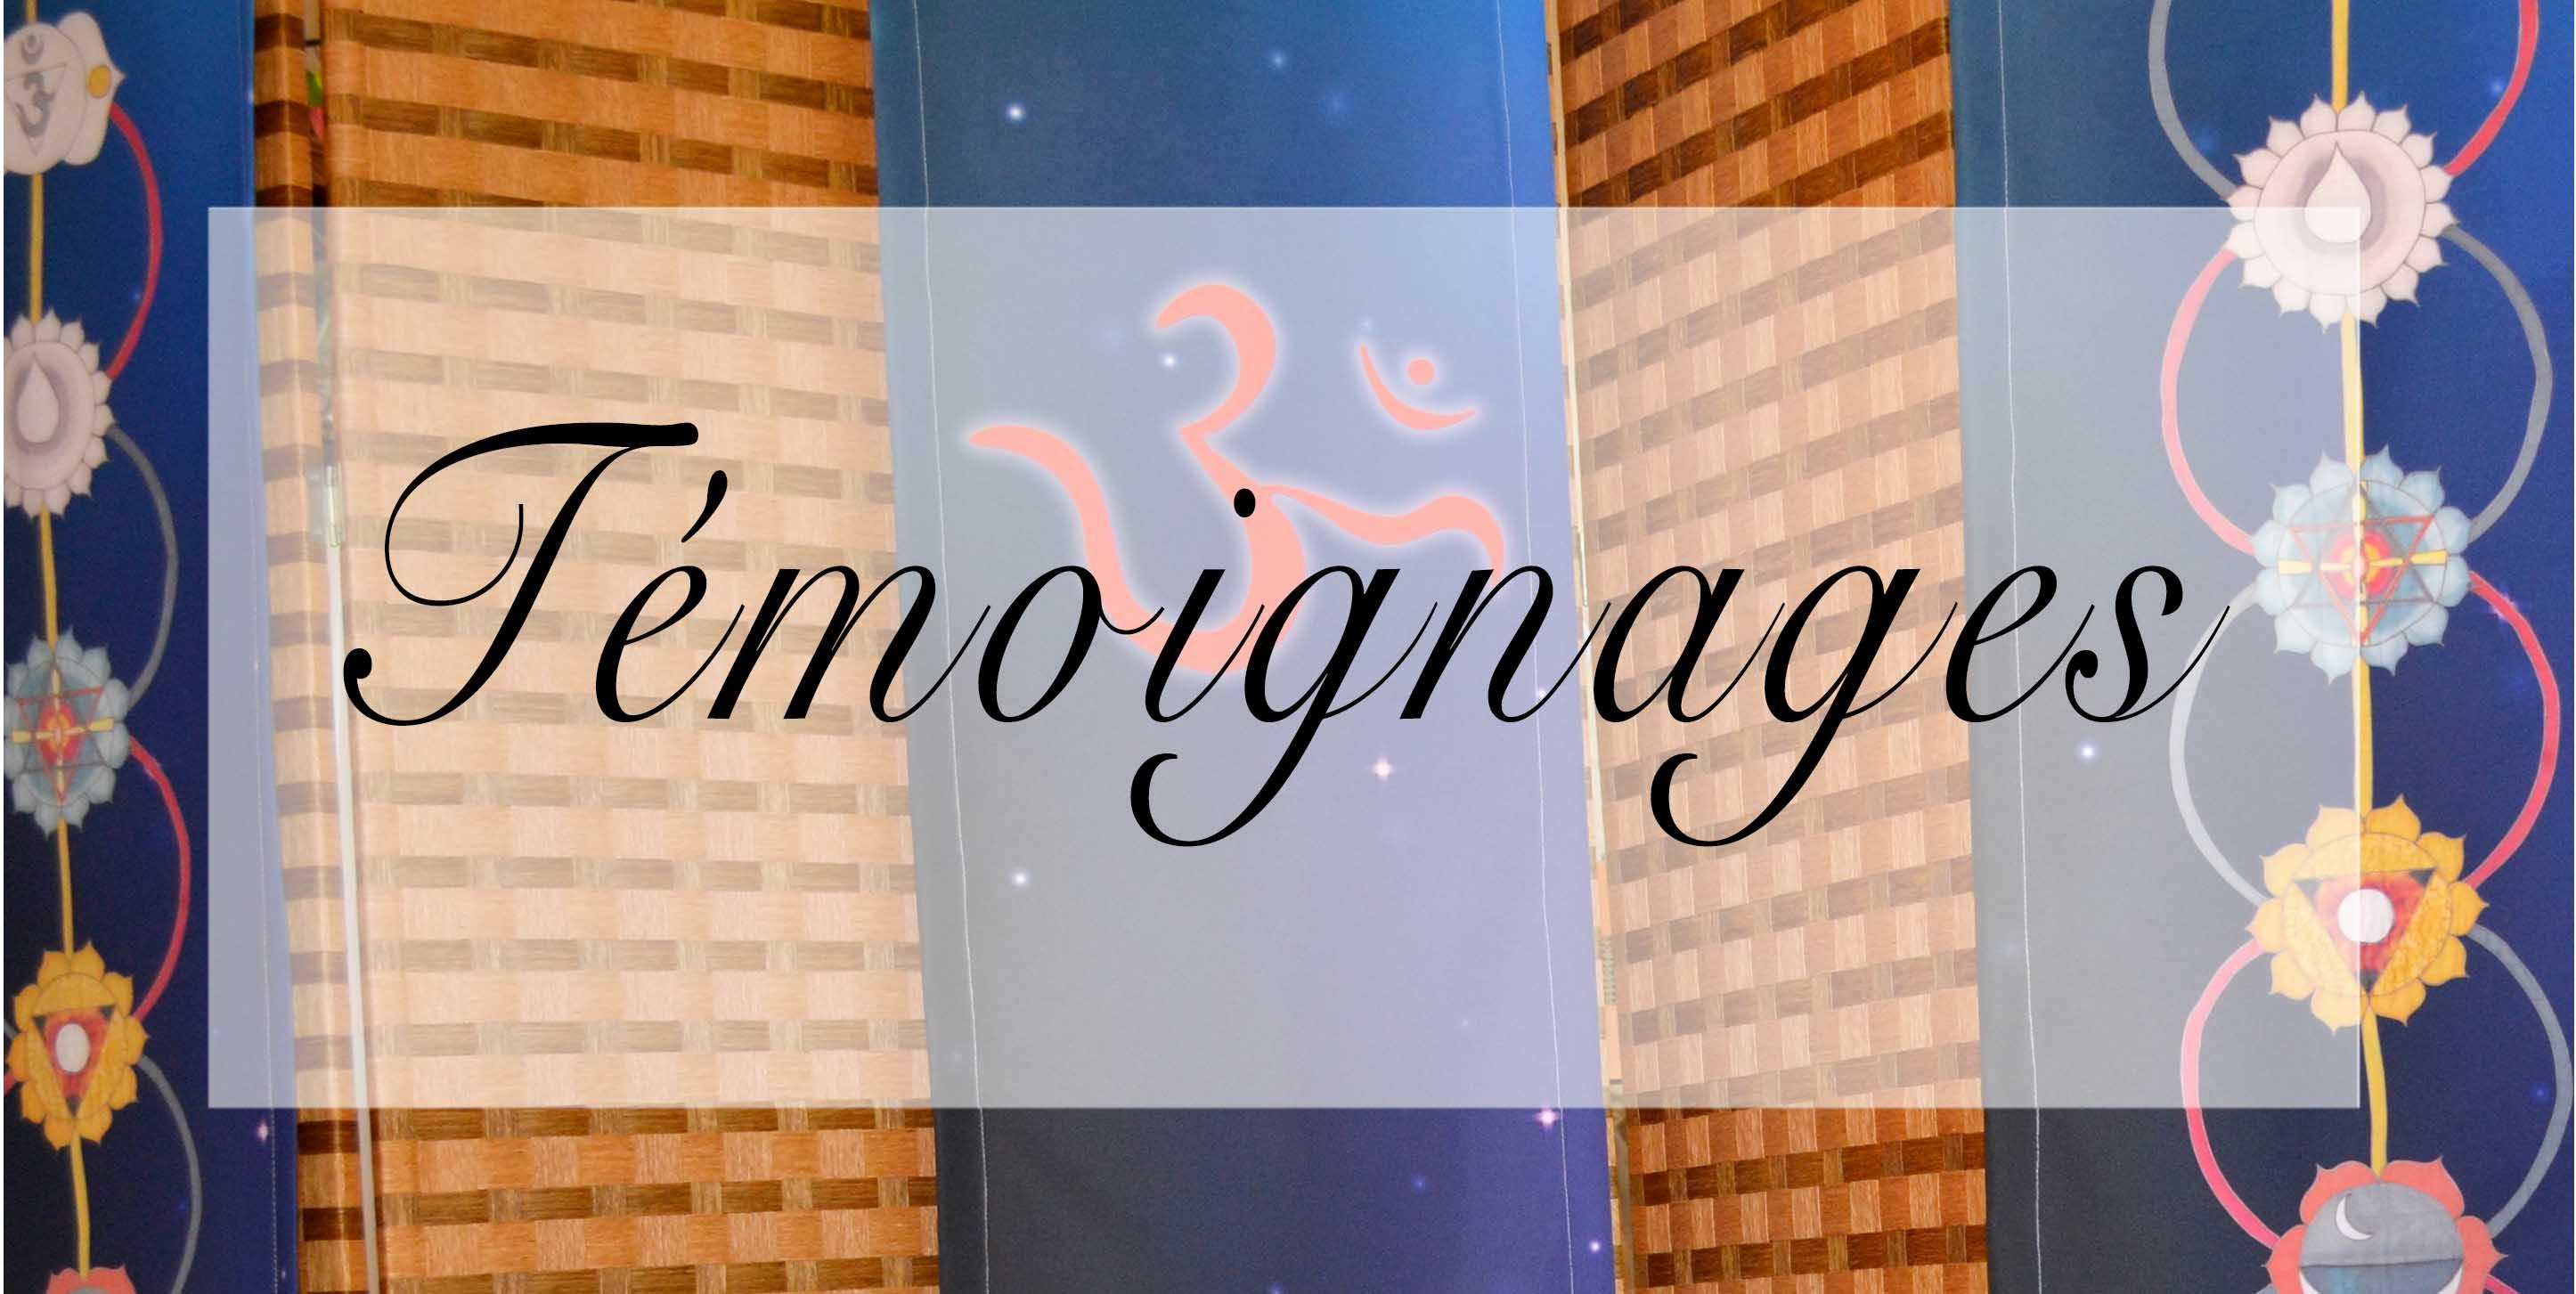 Sonia DJAOUI, Centre de Yoga Traditionnel (Satyananda), Hatha-Yoga, Yoga-Nidrâ, Méditation, a Tours - 37 -  02 47 37 47 94